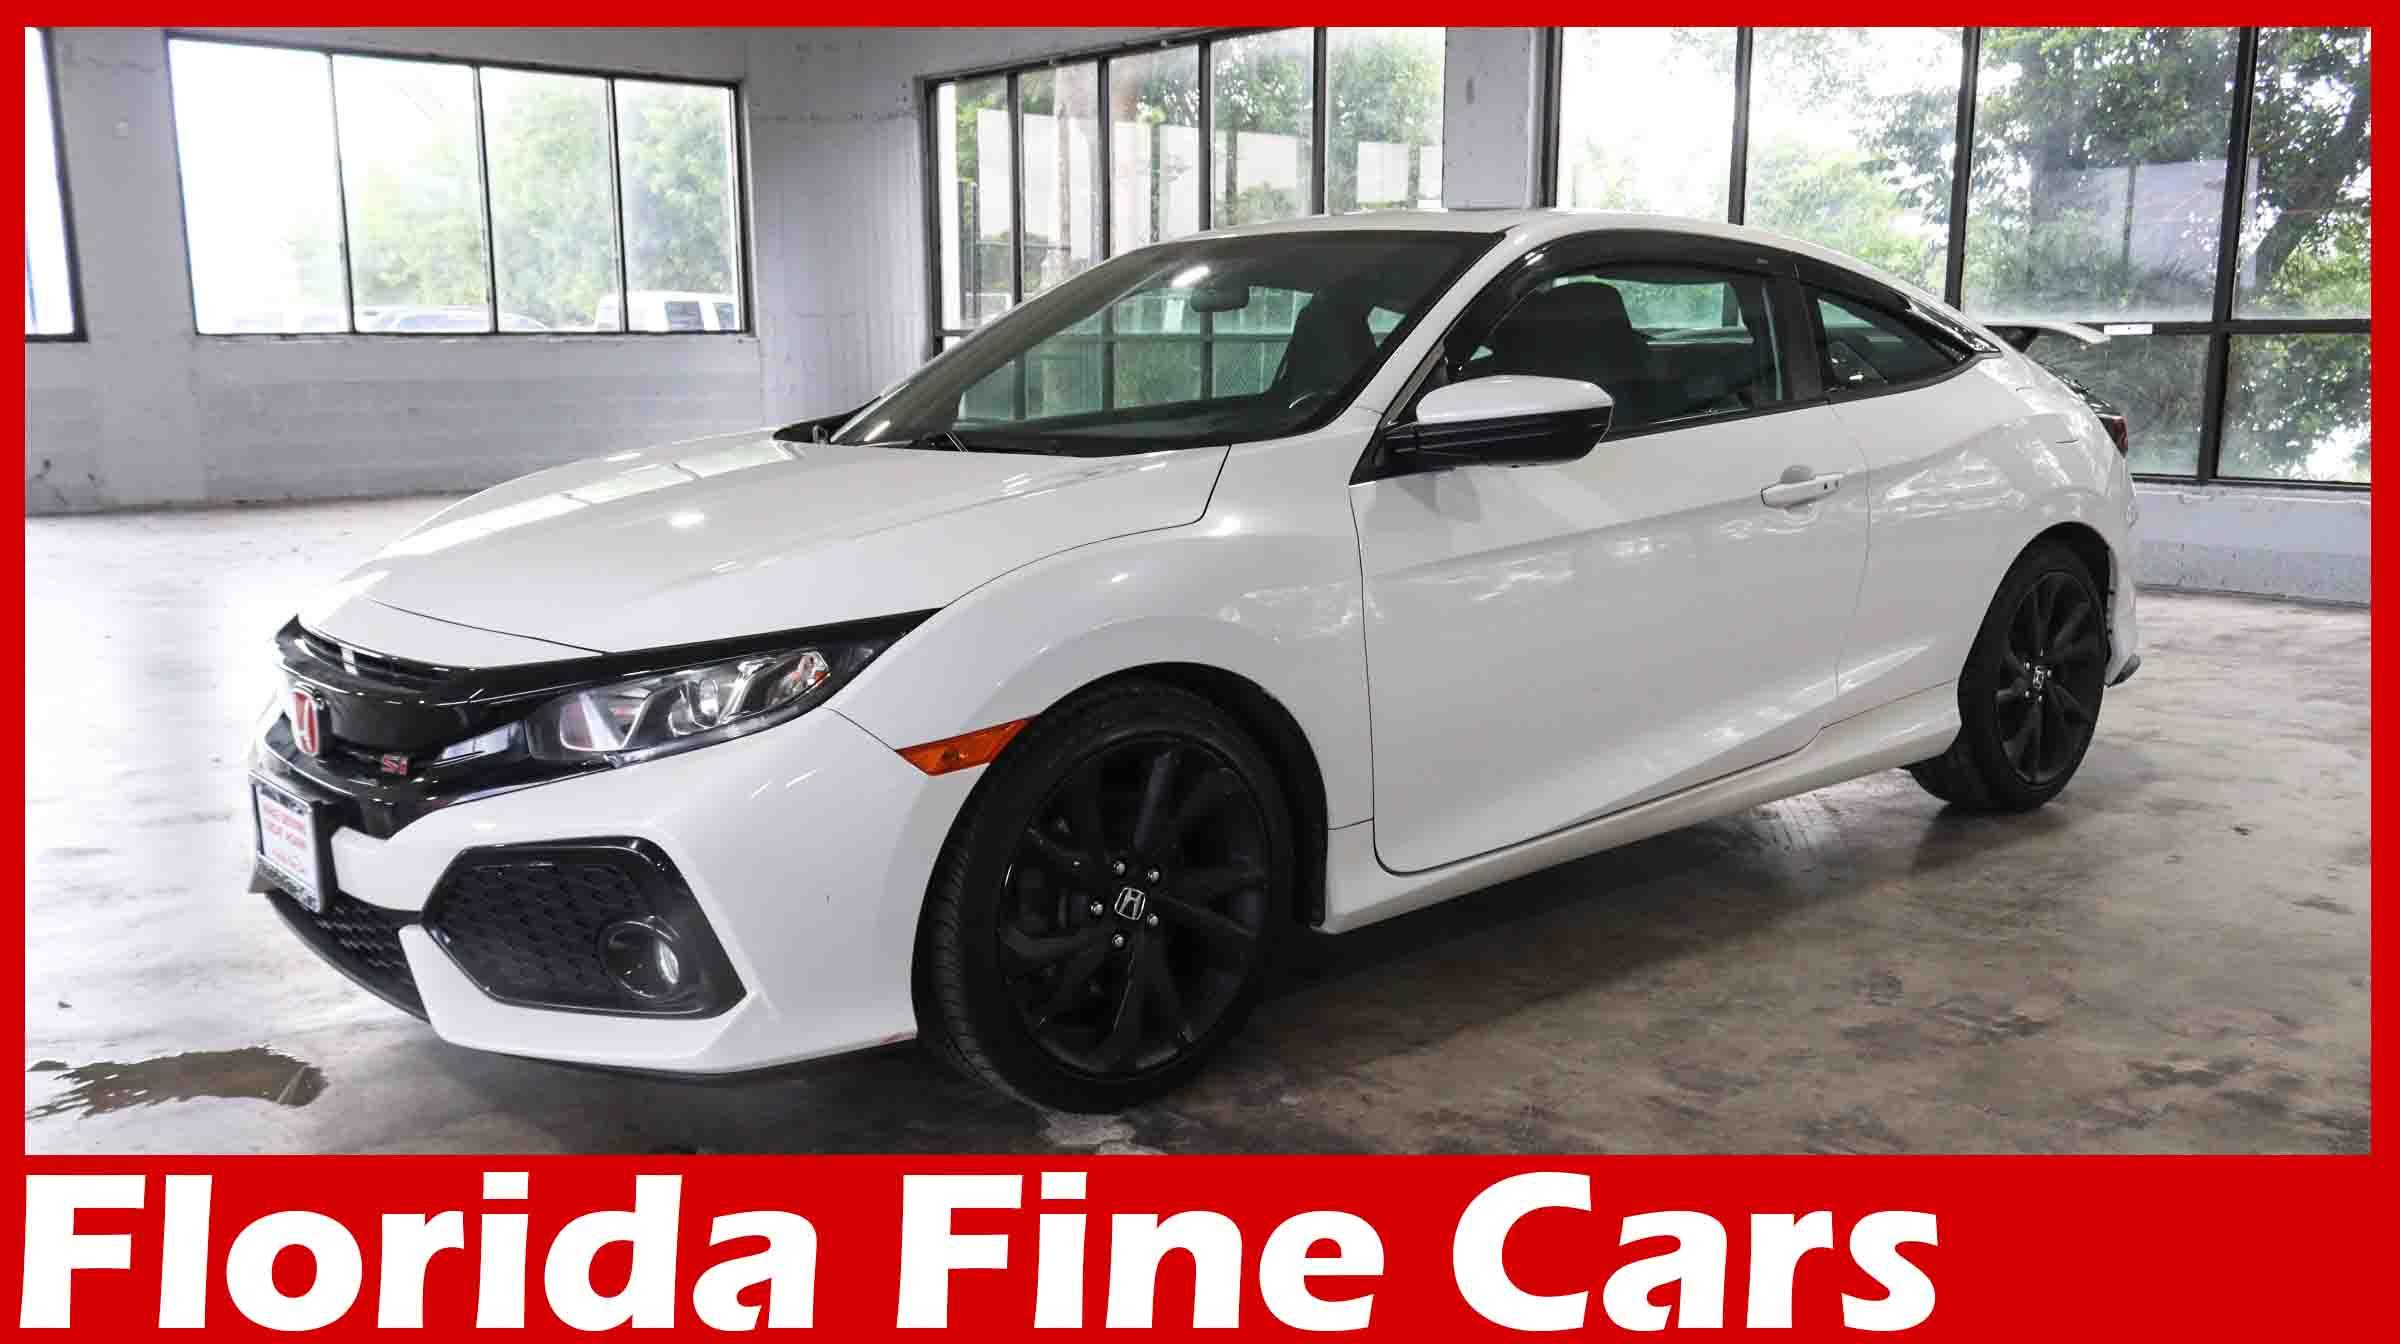 Honda Civic Si Coupe Under 500 Dollars Down